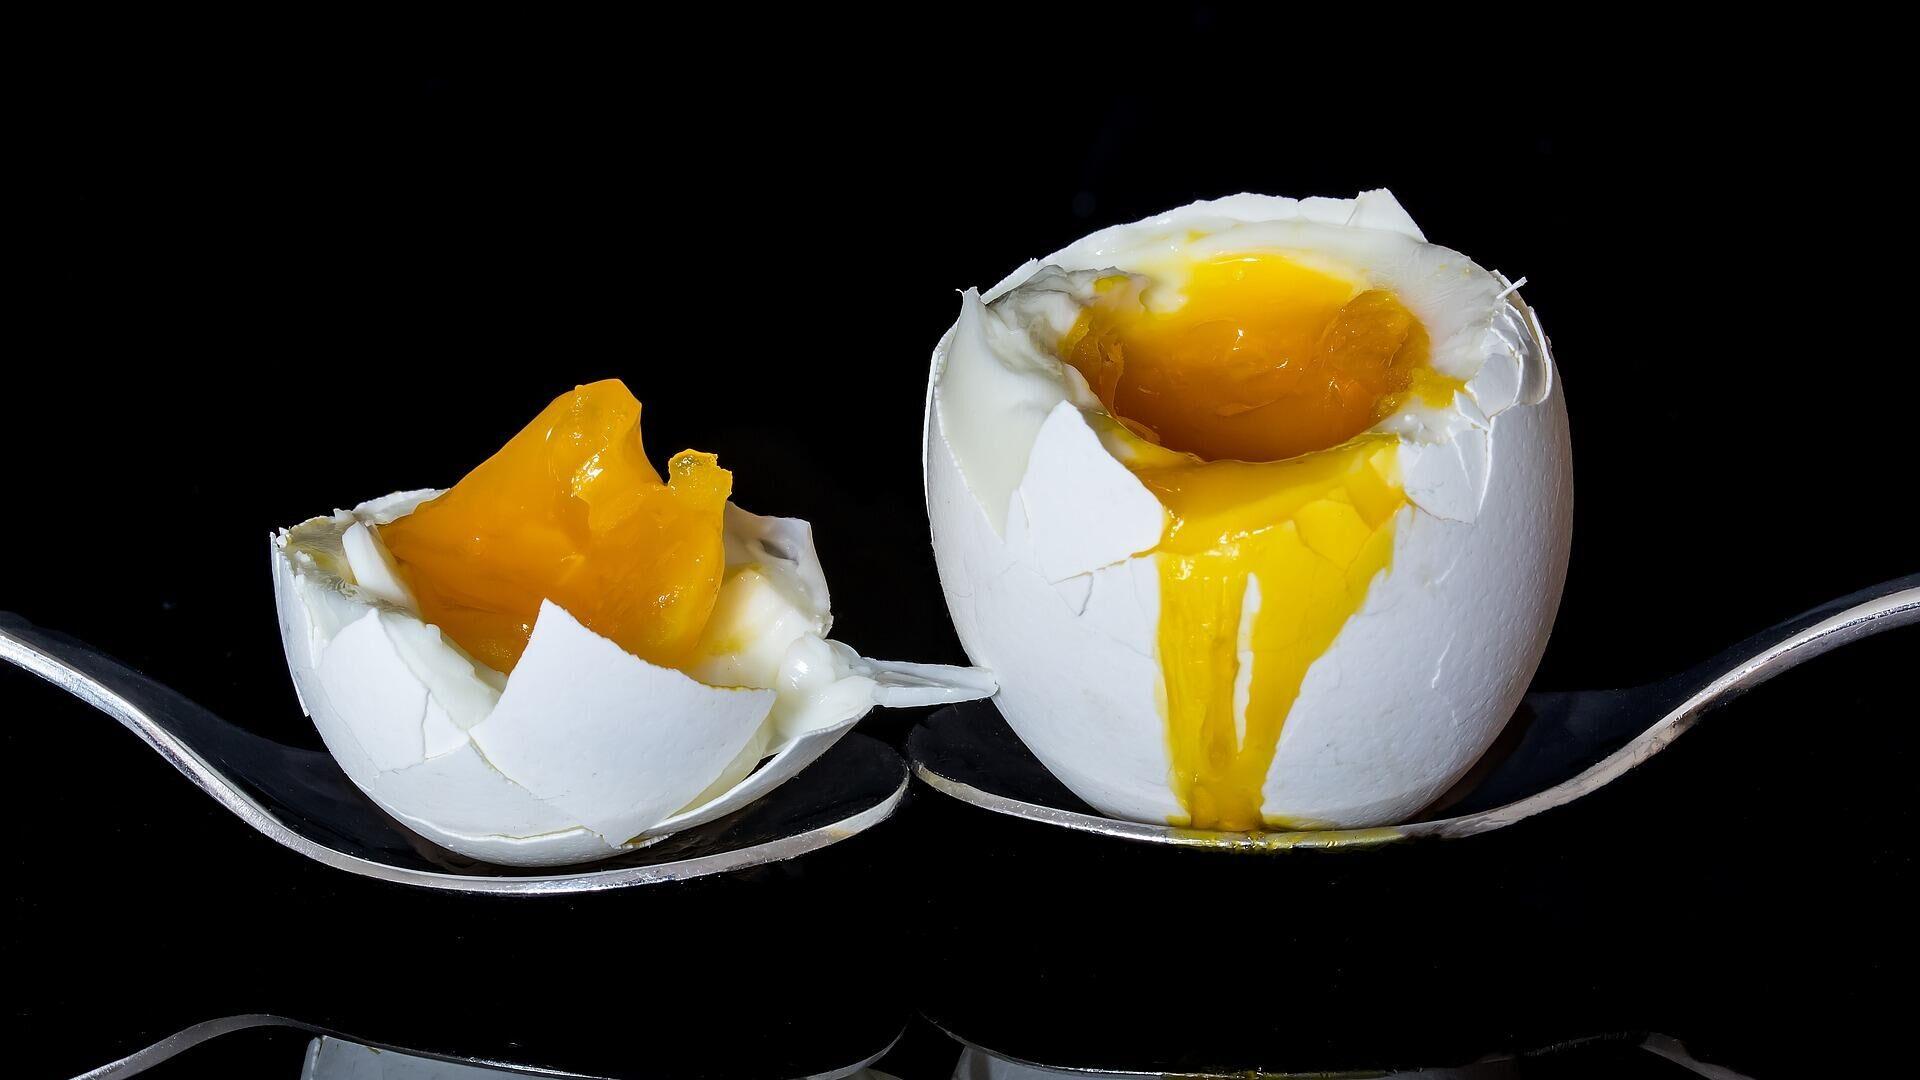 Un huevo, imagen ilustrativa - Sputnik Mundo, 1920, 26.03.2021